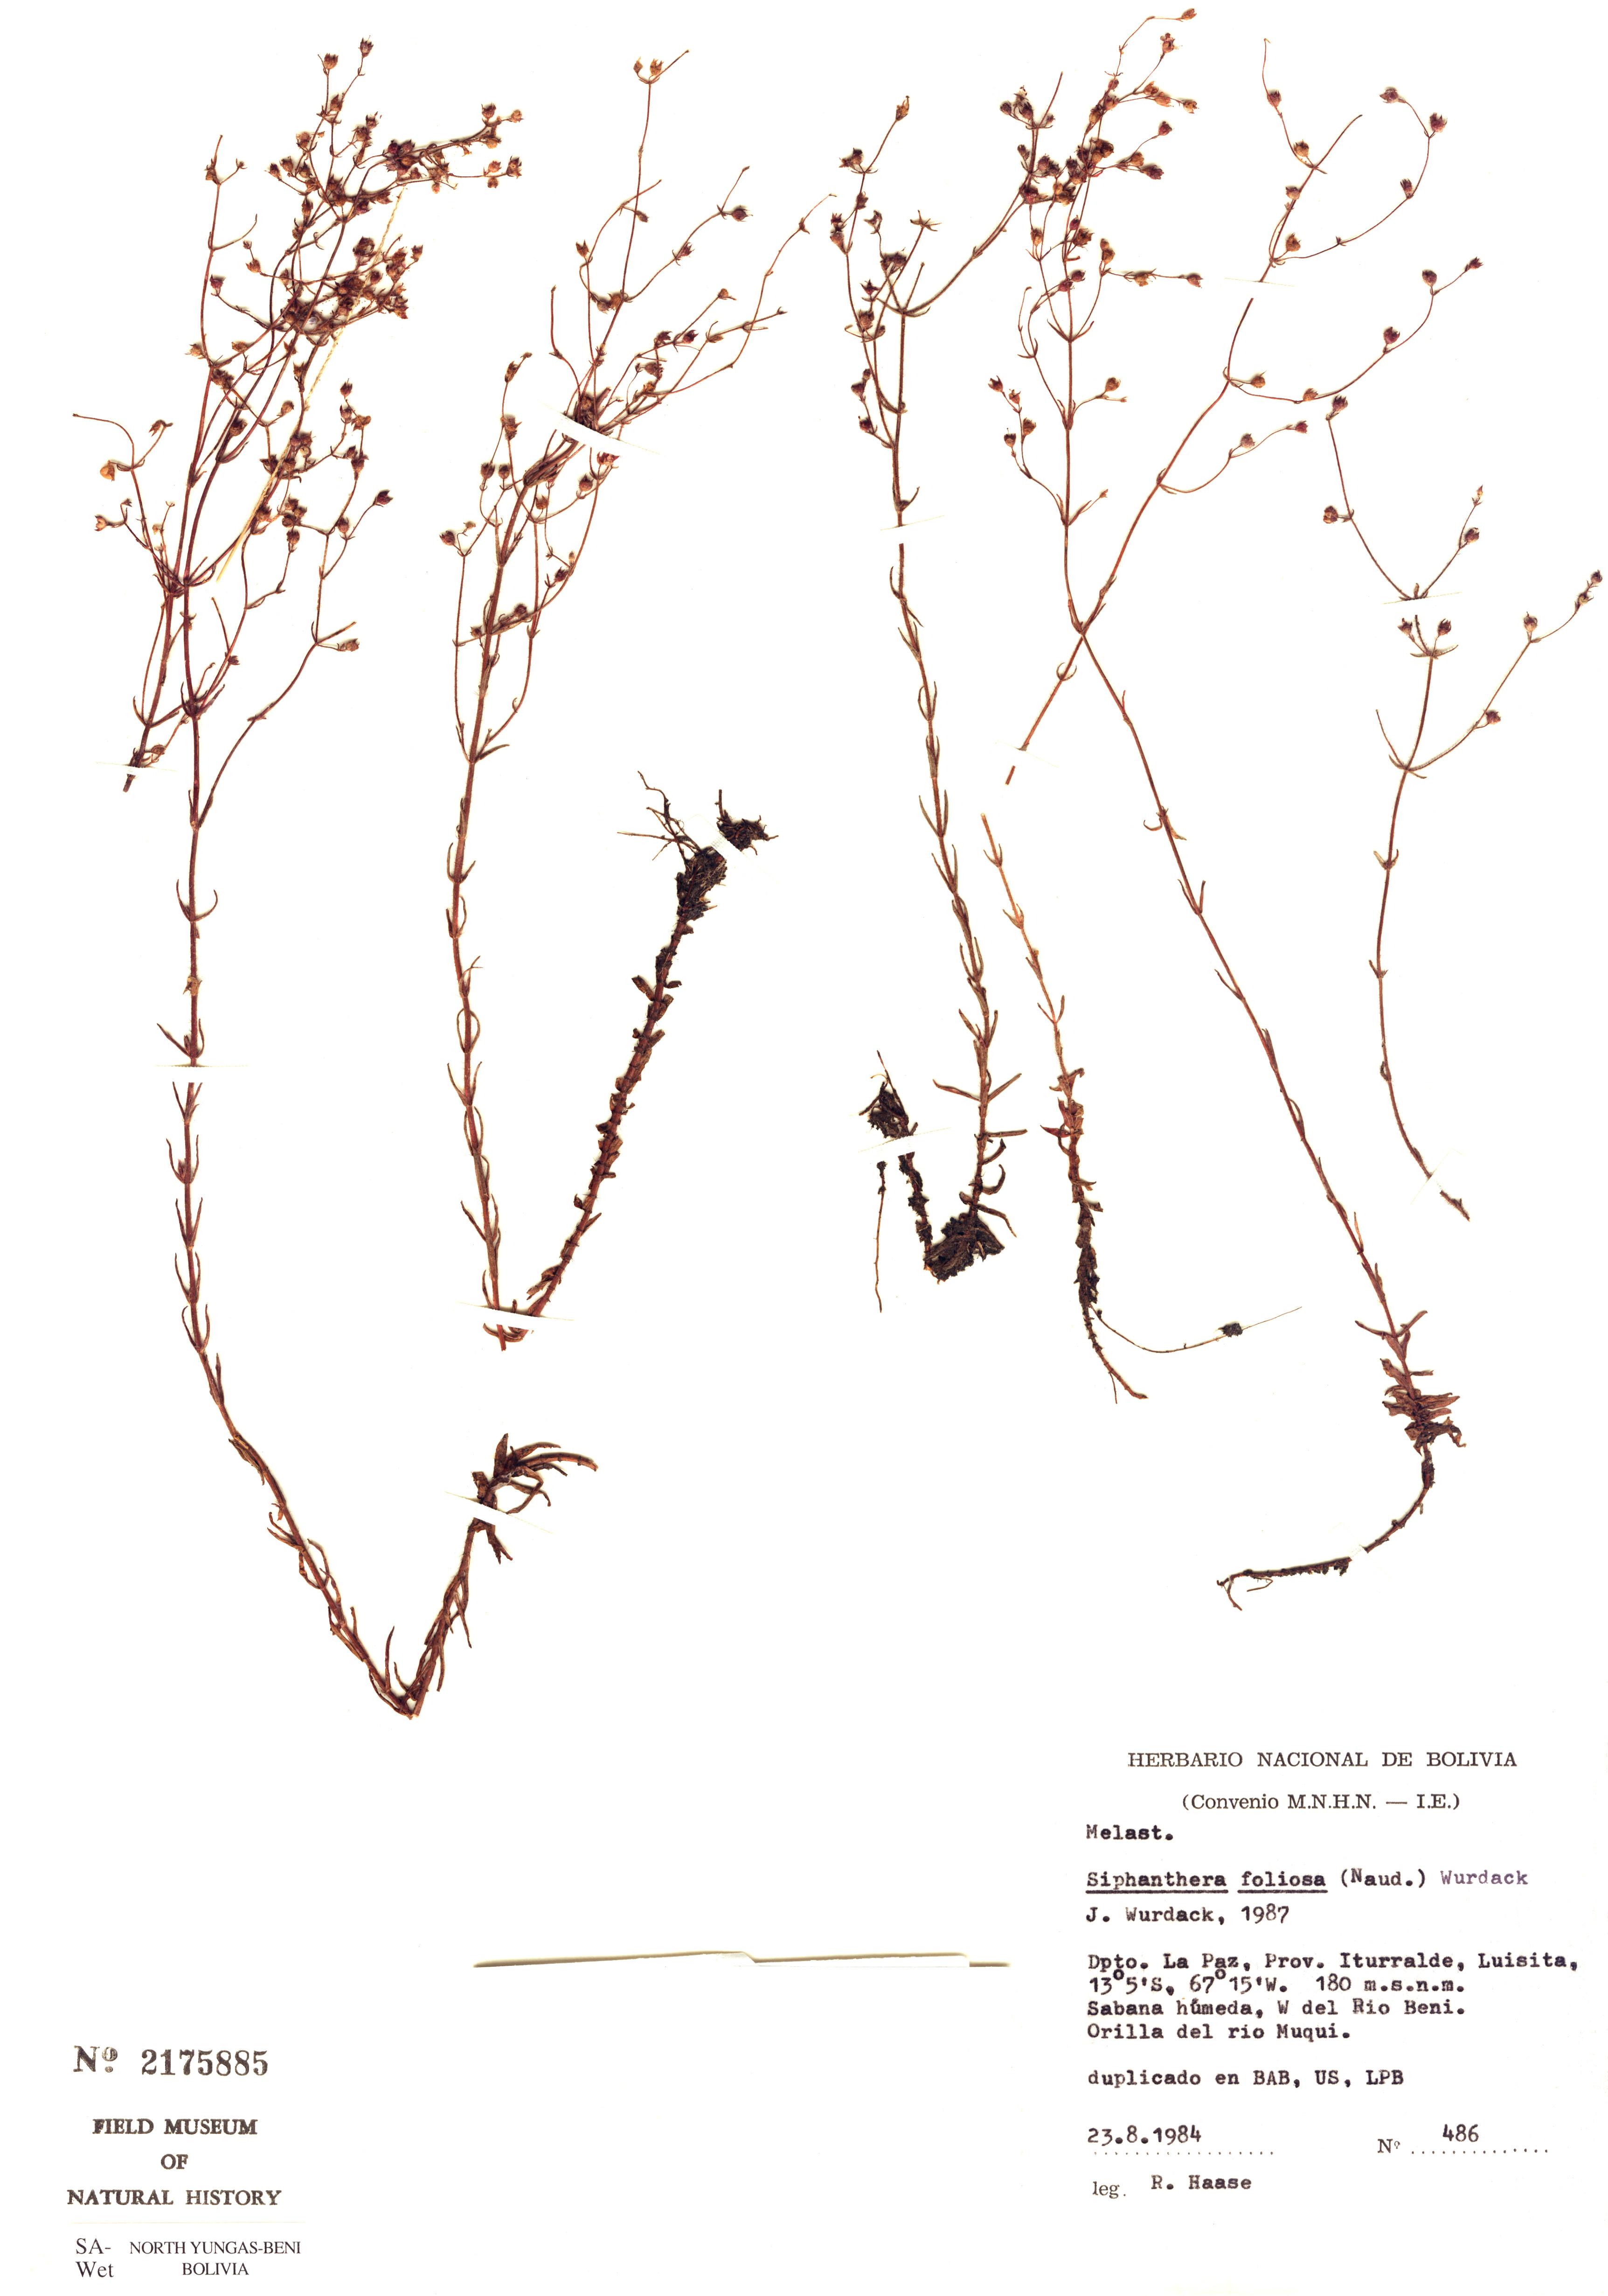 Specimen: Siphanthera foliosa